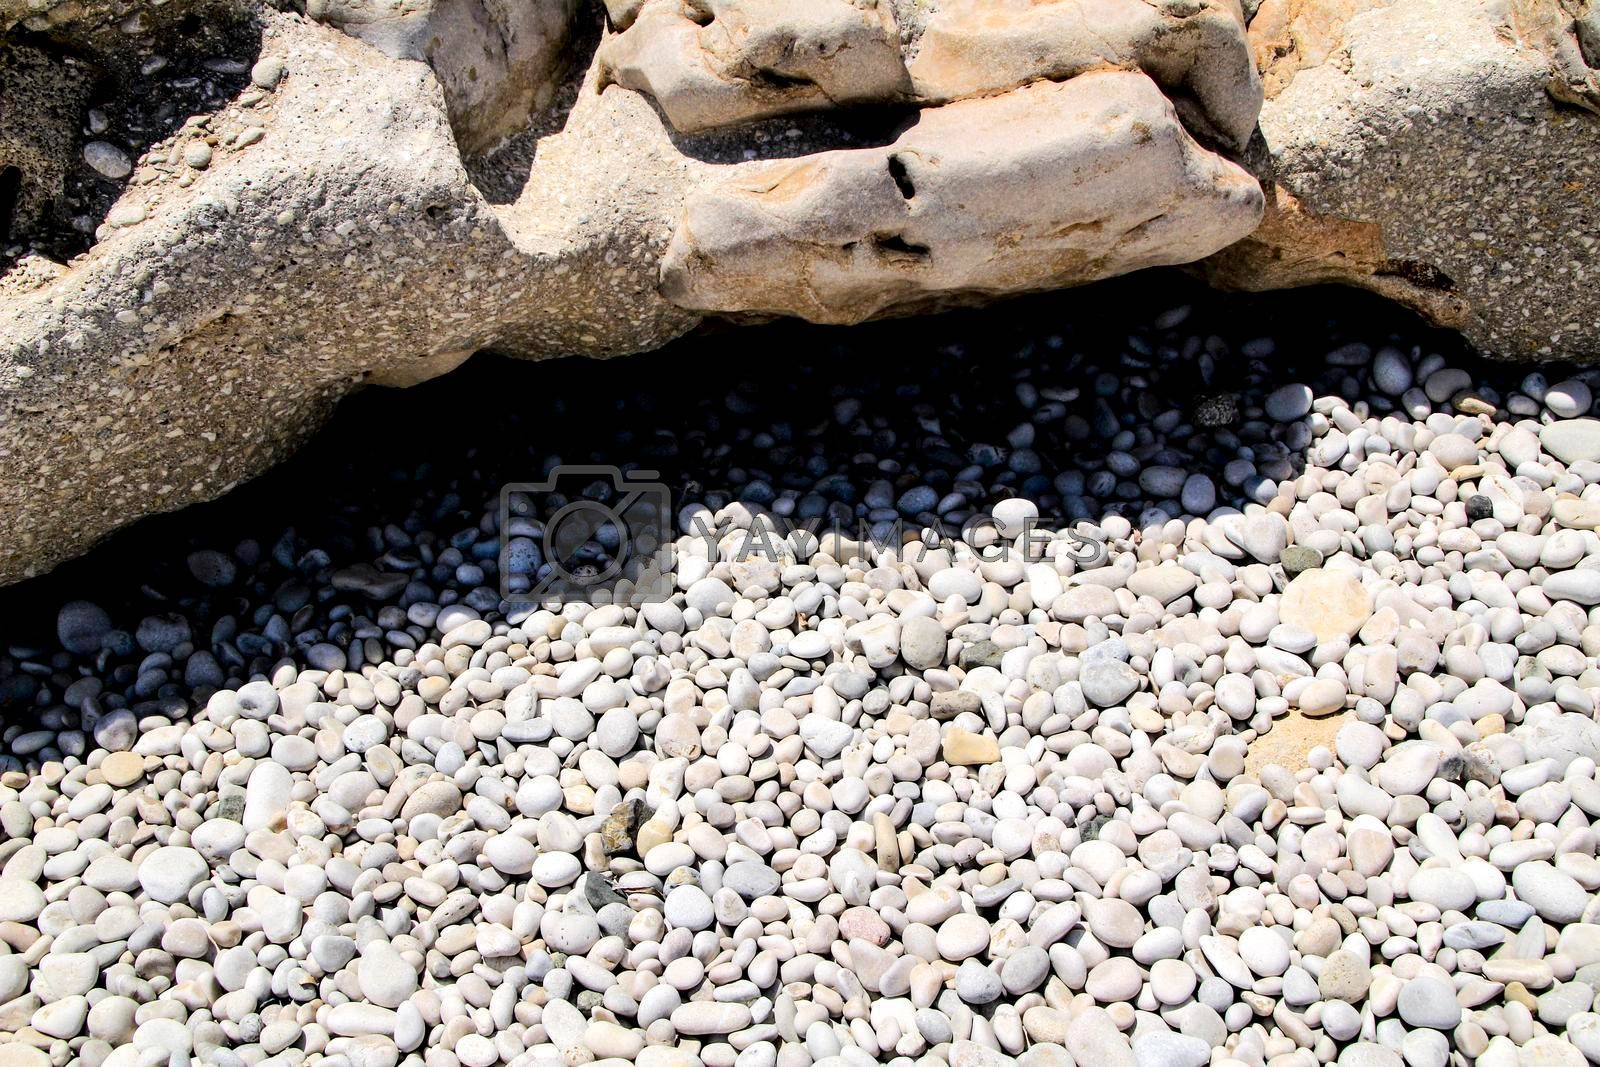 Rocks and pebbles texture on Cap Negret beach in Altea, Alicante, Spain